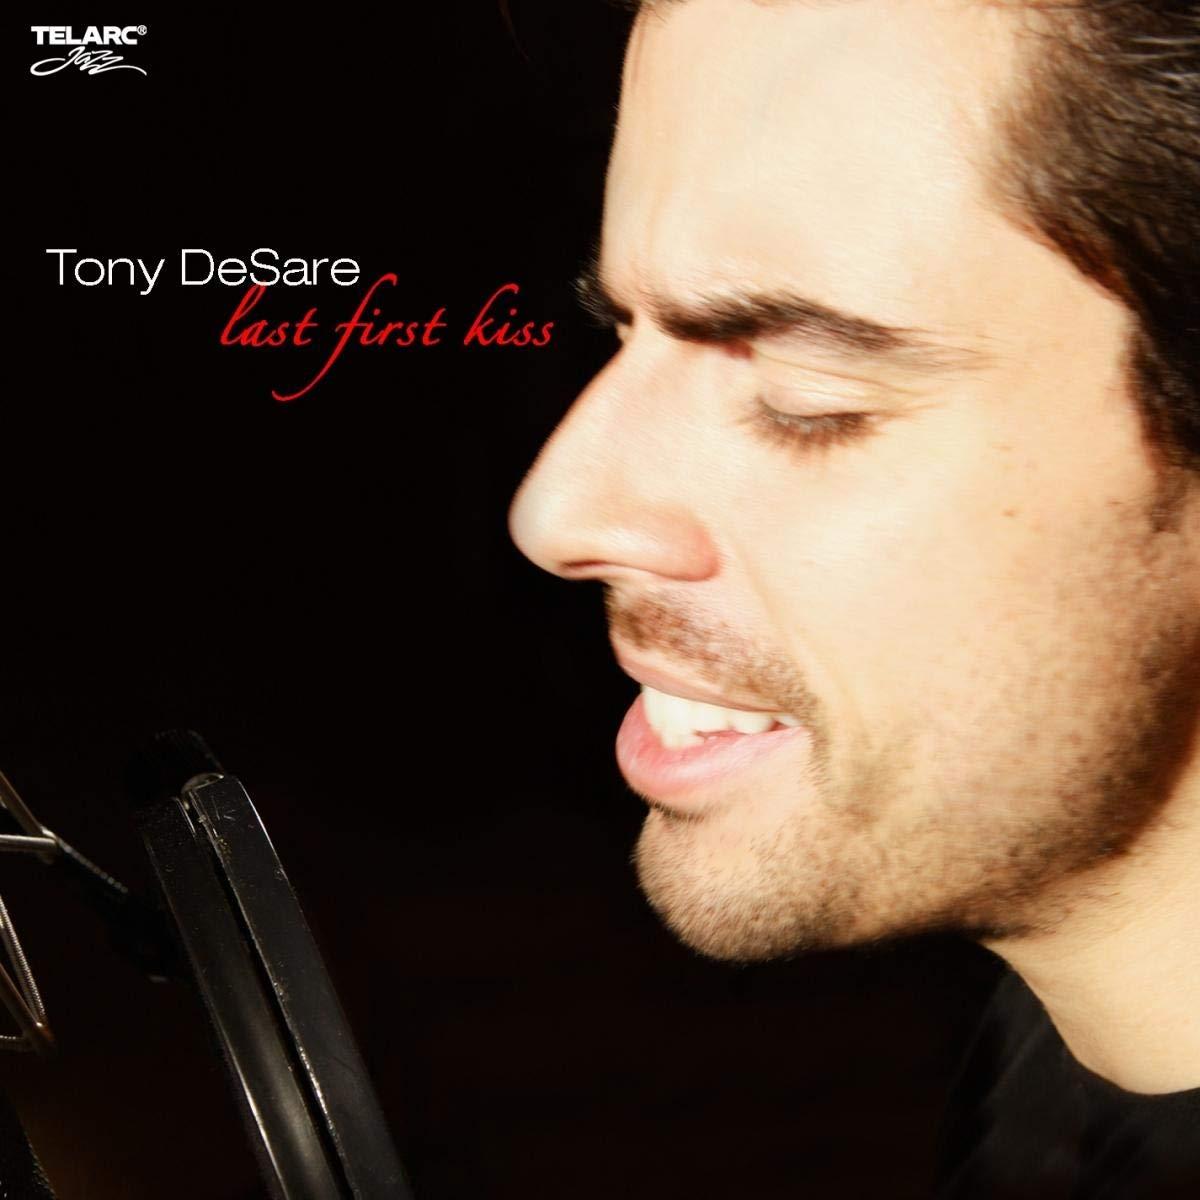 Tony DeSare – Last First Kiss (2007) [FLAC]